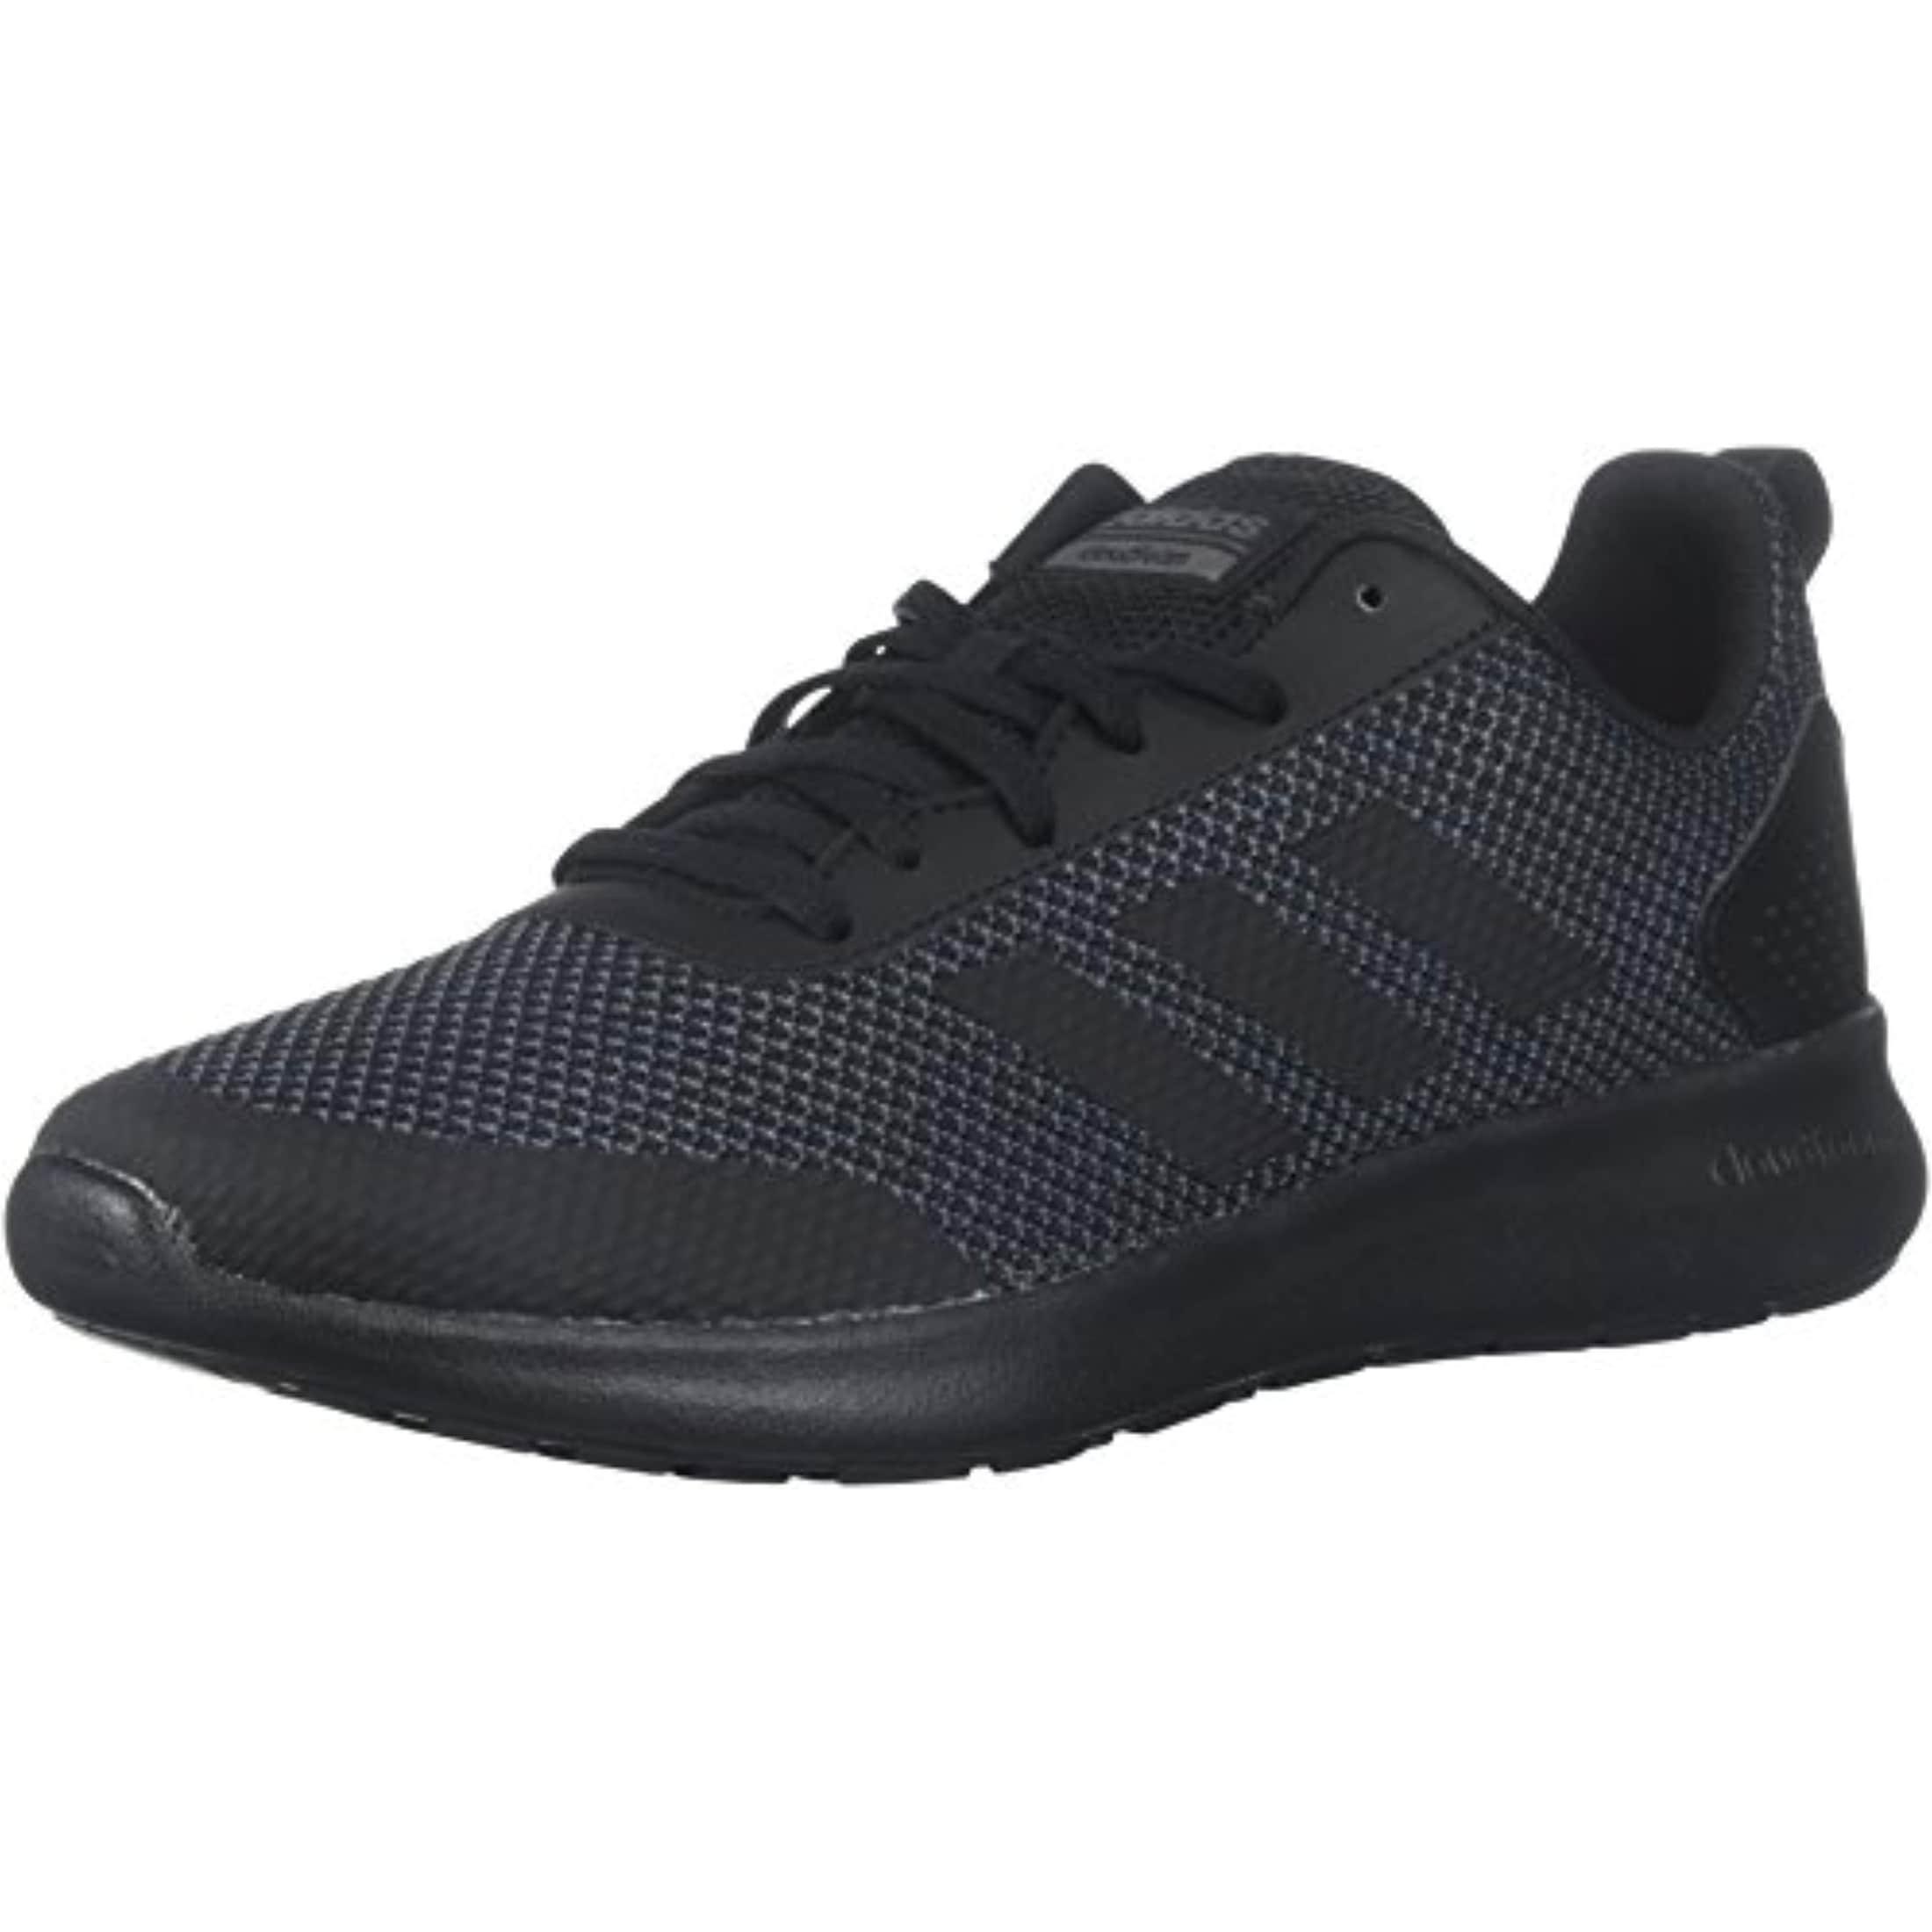 Element Race Running Shoe, Black/Black